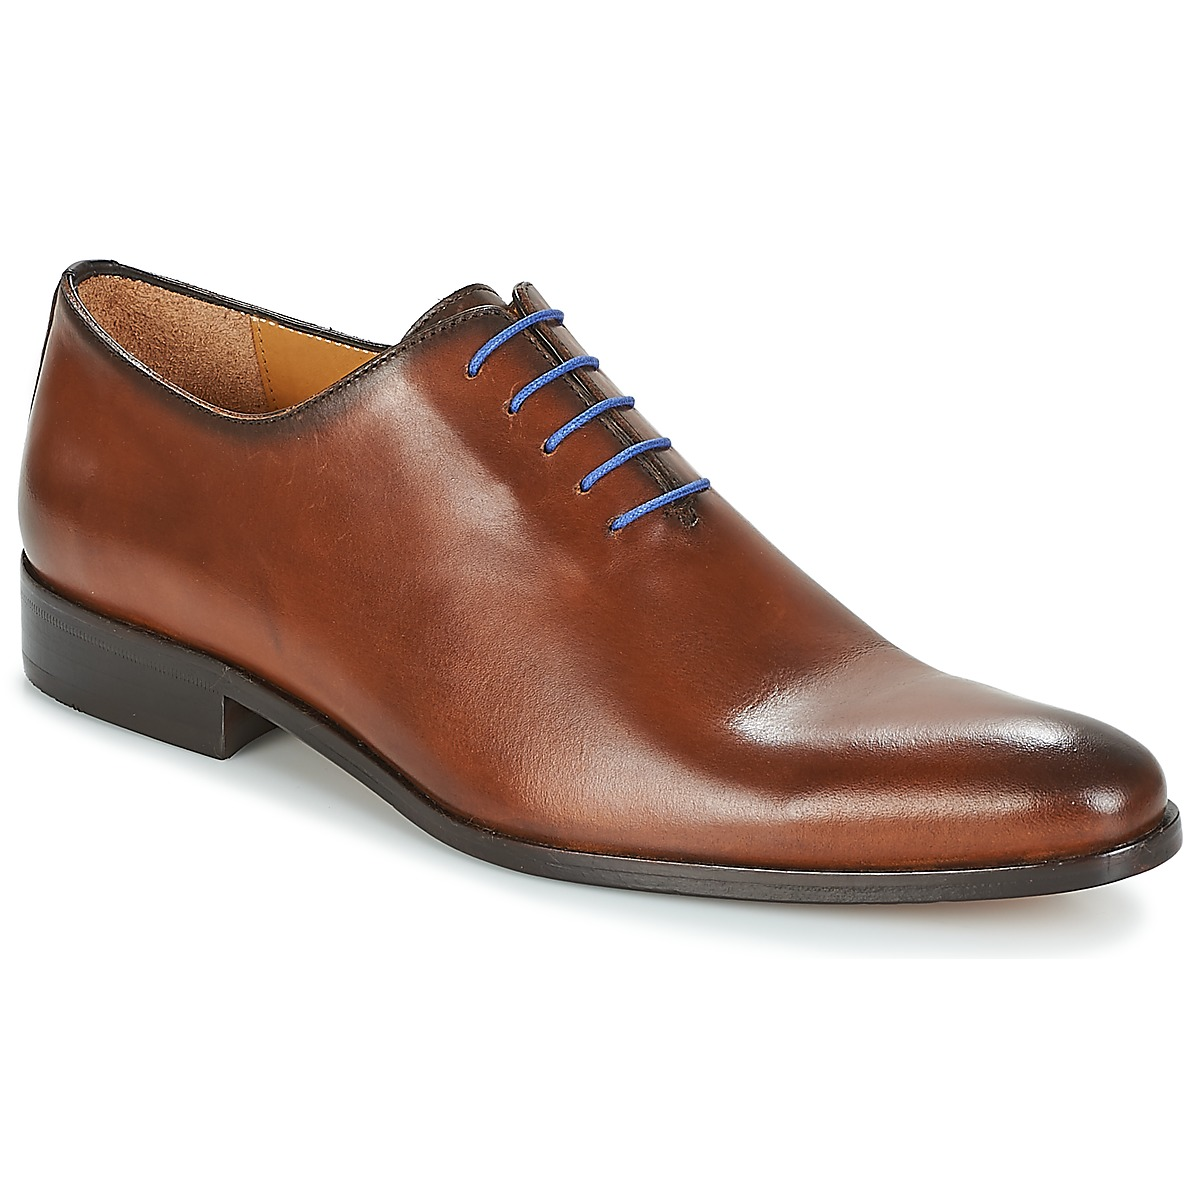 Chaussures Derby Homme - Marron - Marron (Cognac 04 4), 42 EUSalamander